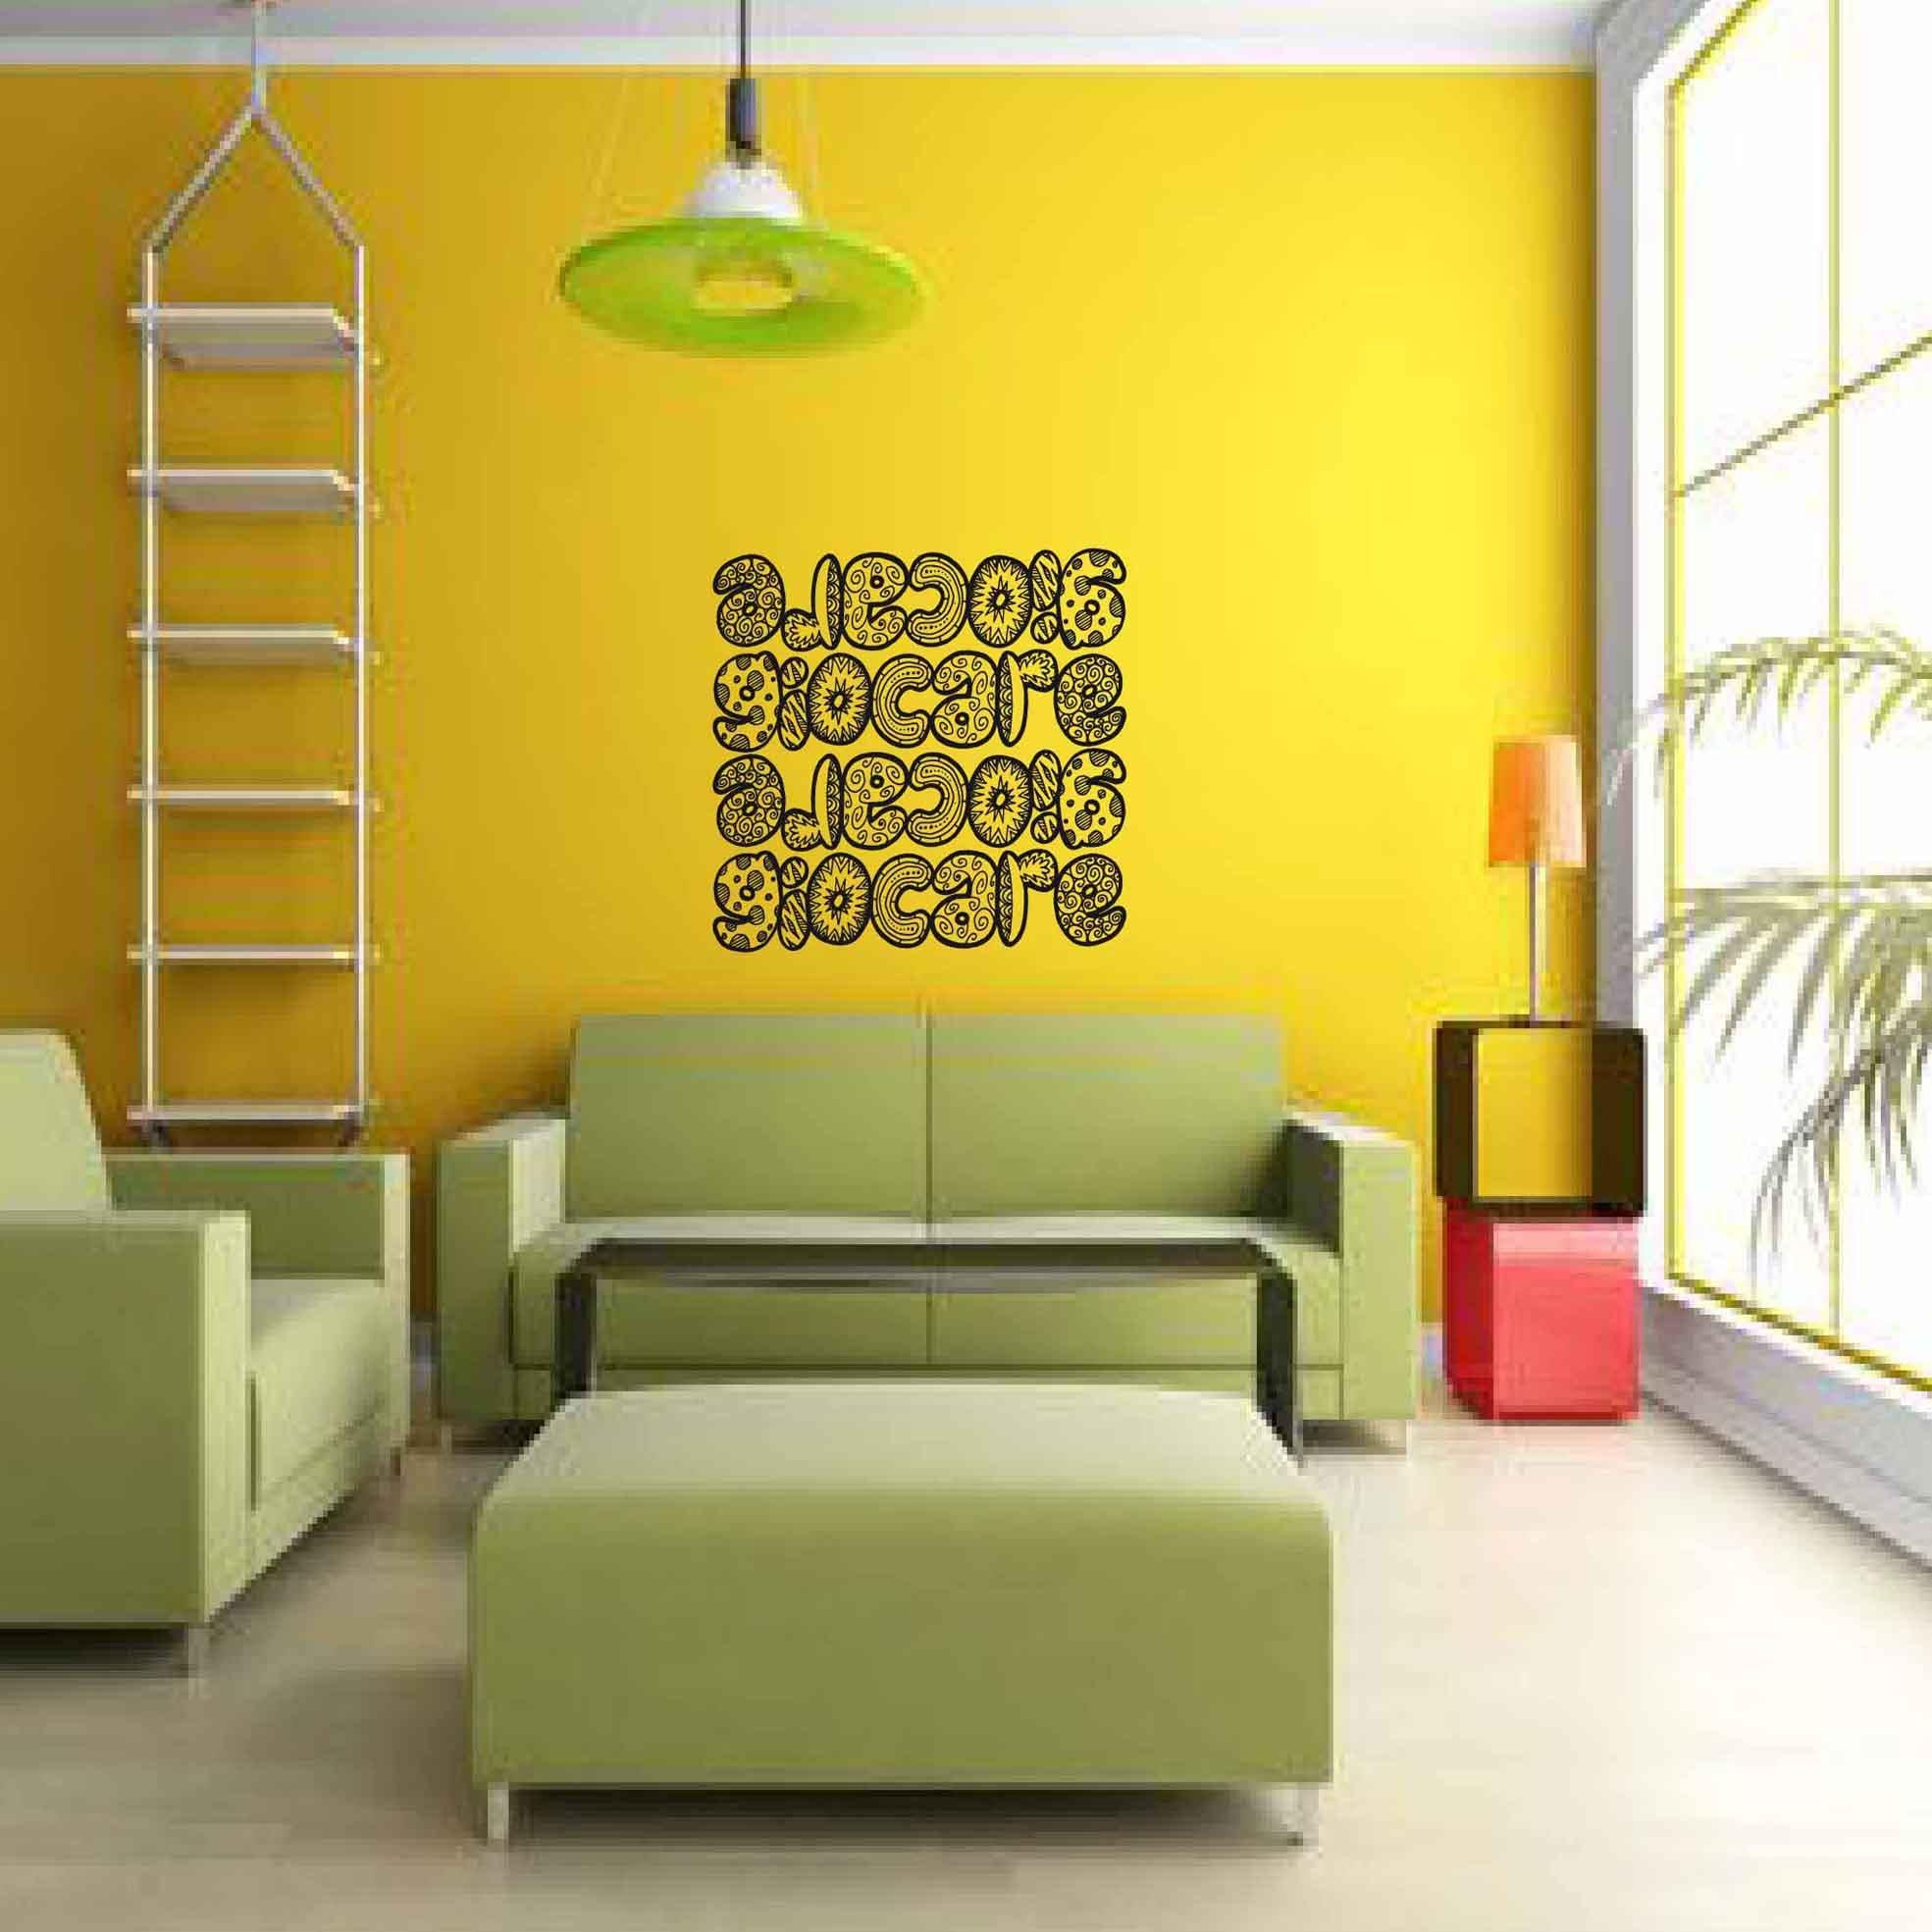 Giocare - Wall sticker, wall decor, wall art, door sticker, glass ...